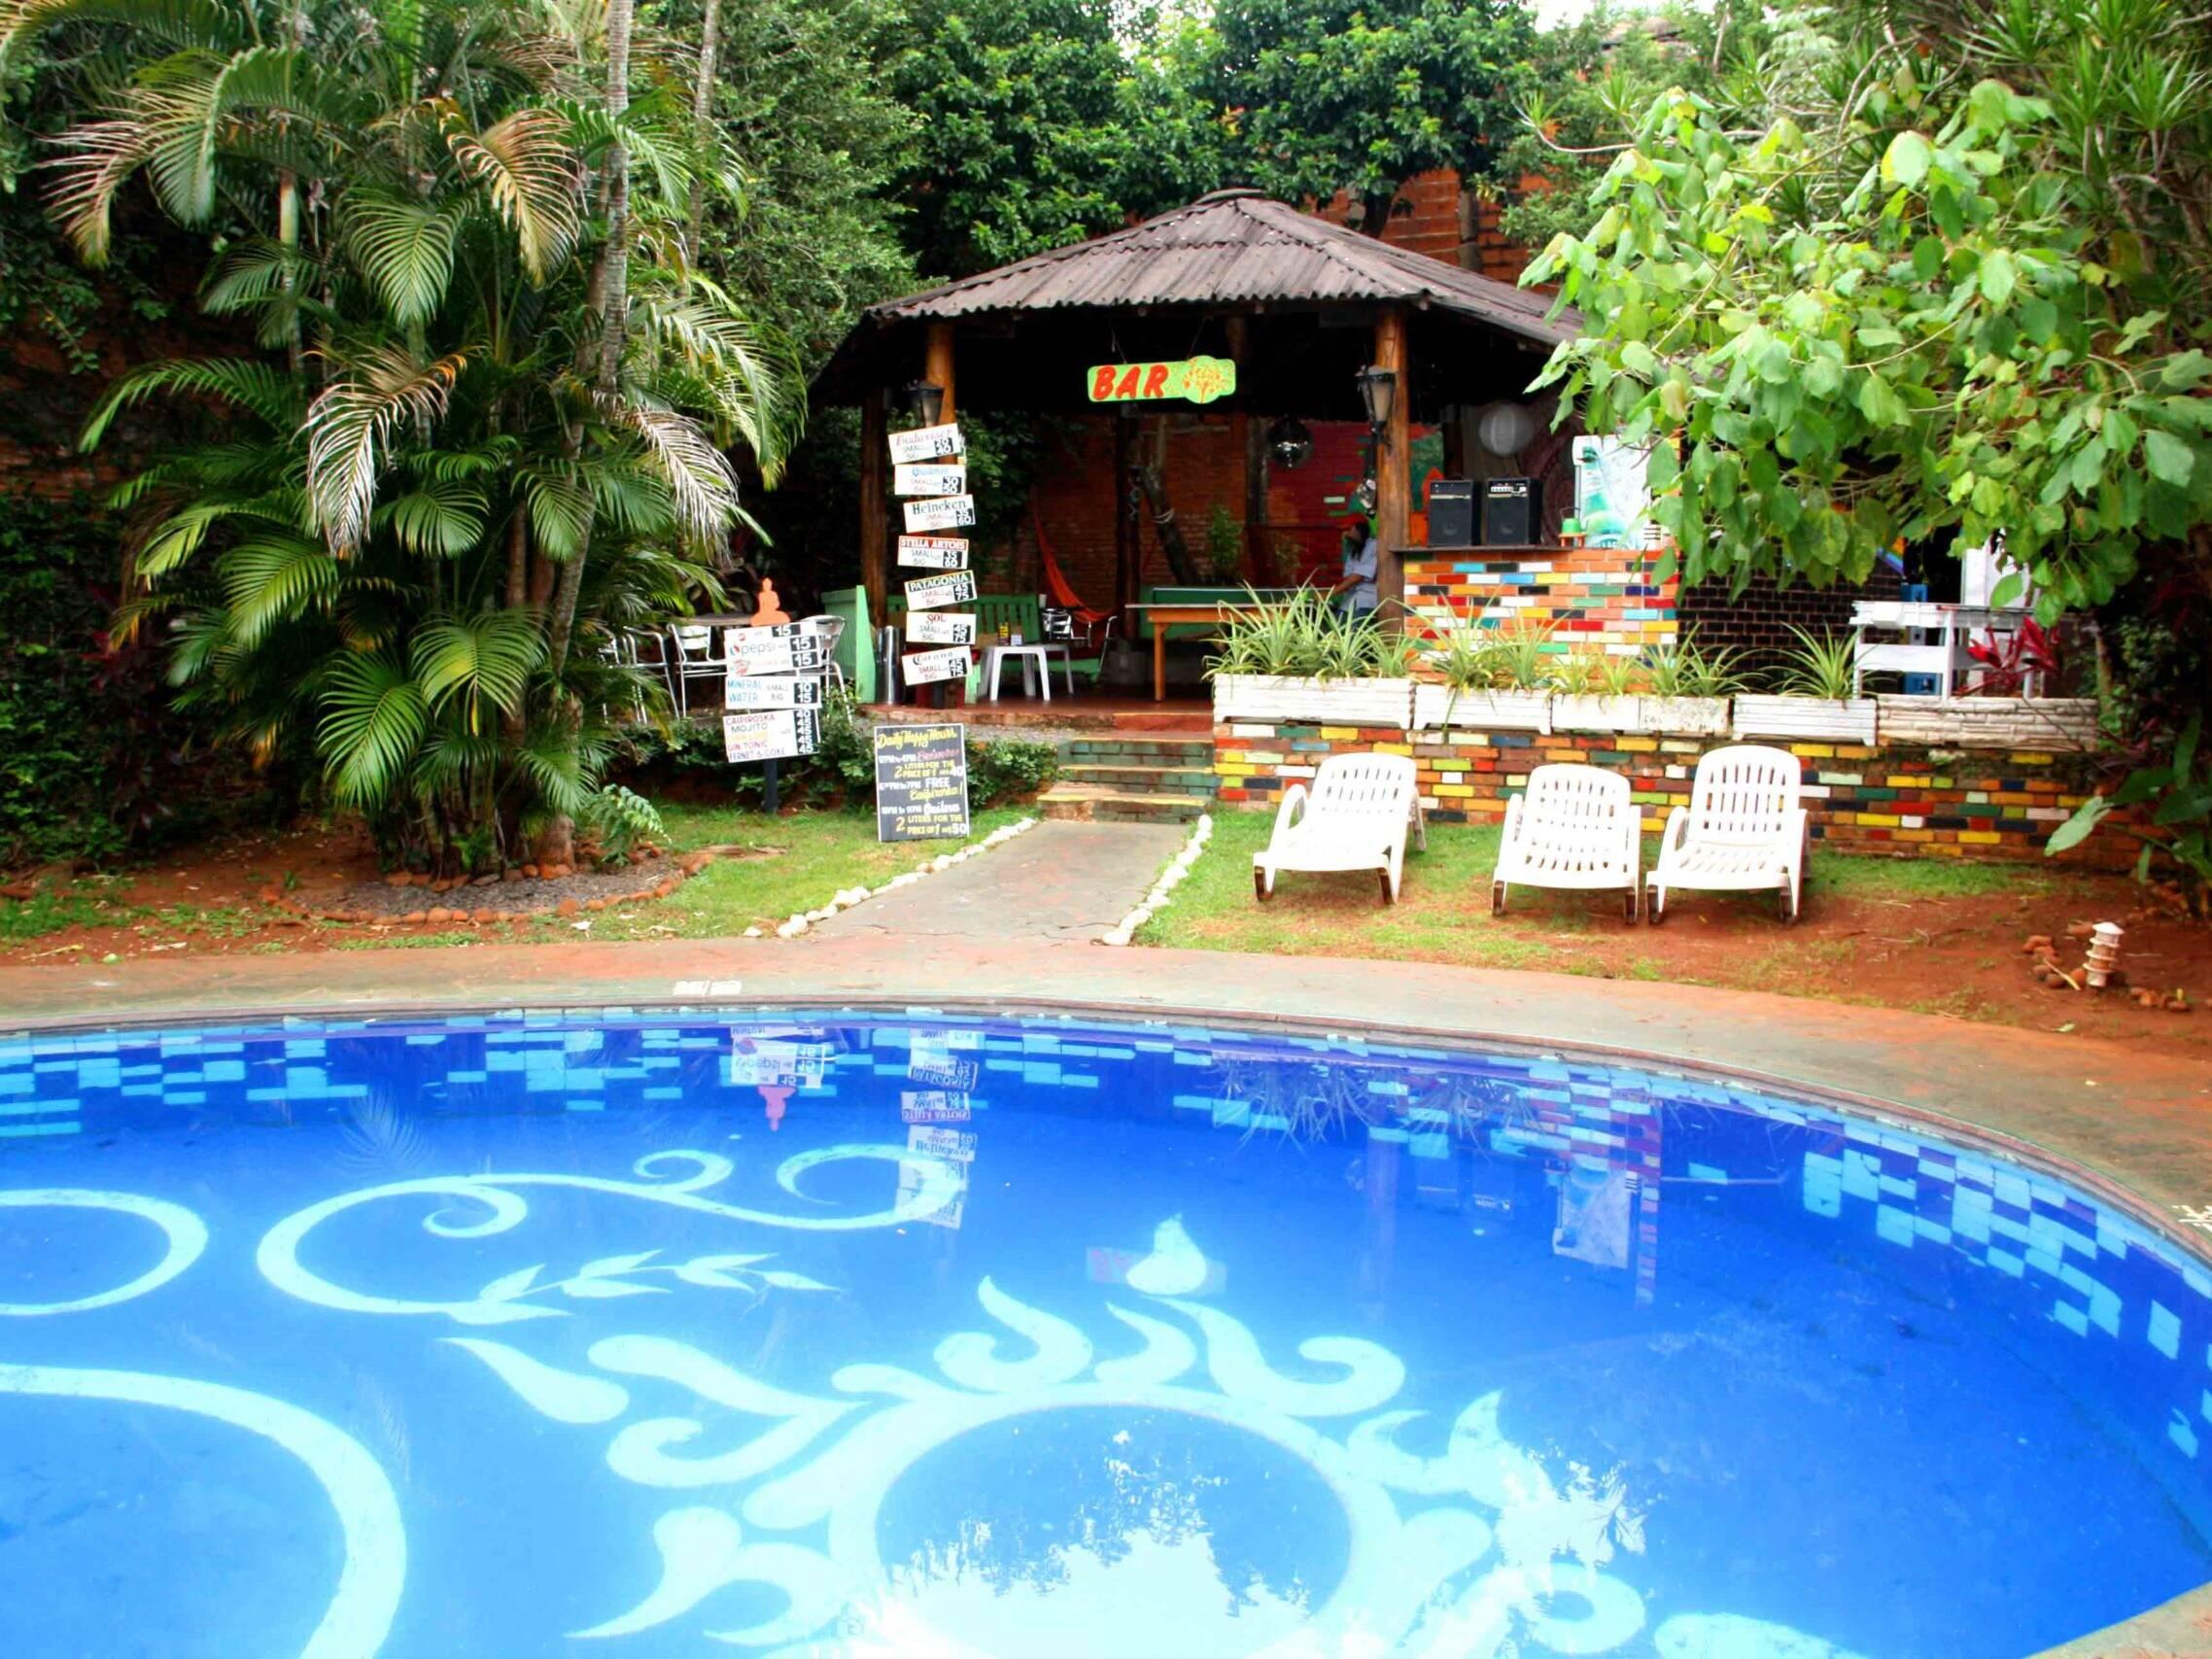 Swimming pool at Mango Chill Hostel in Iguazu Argentina